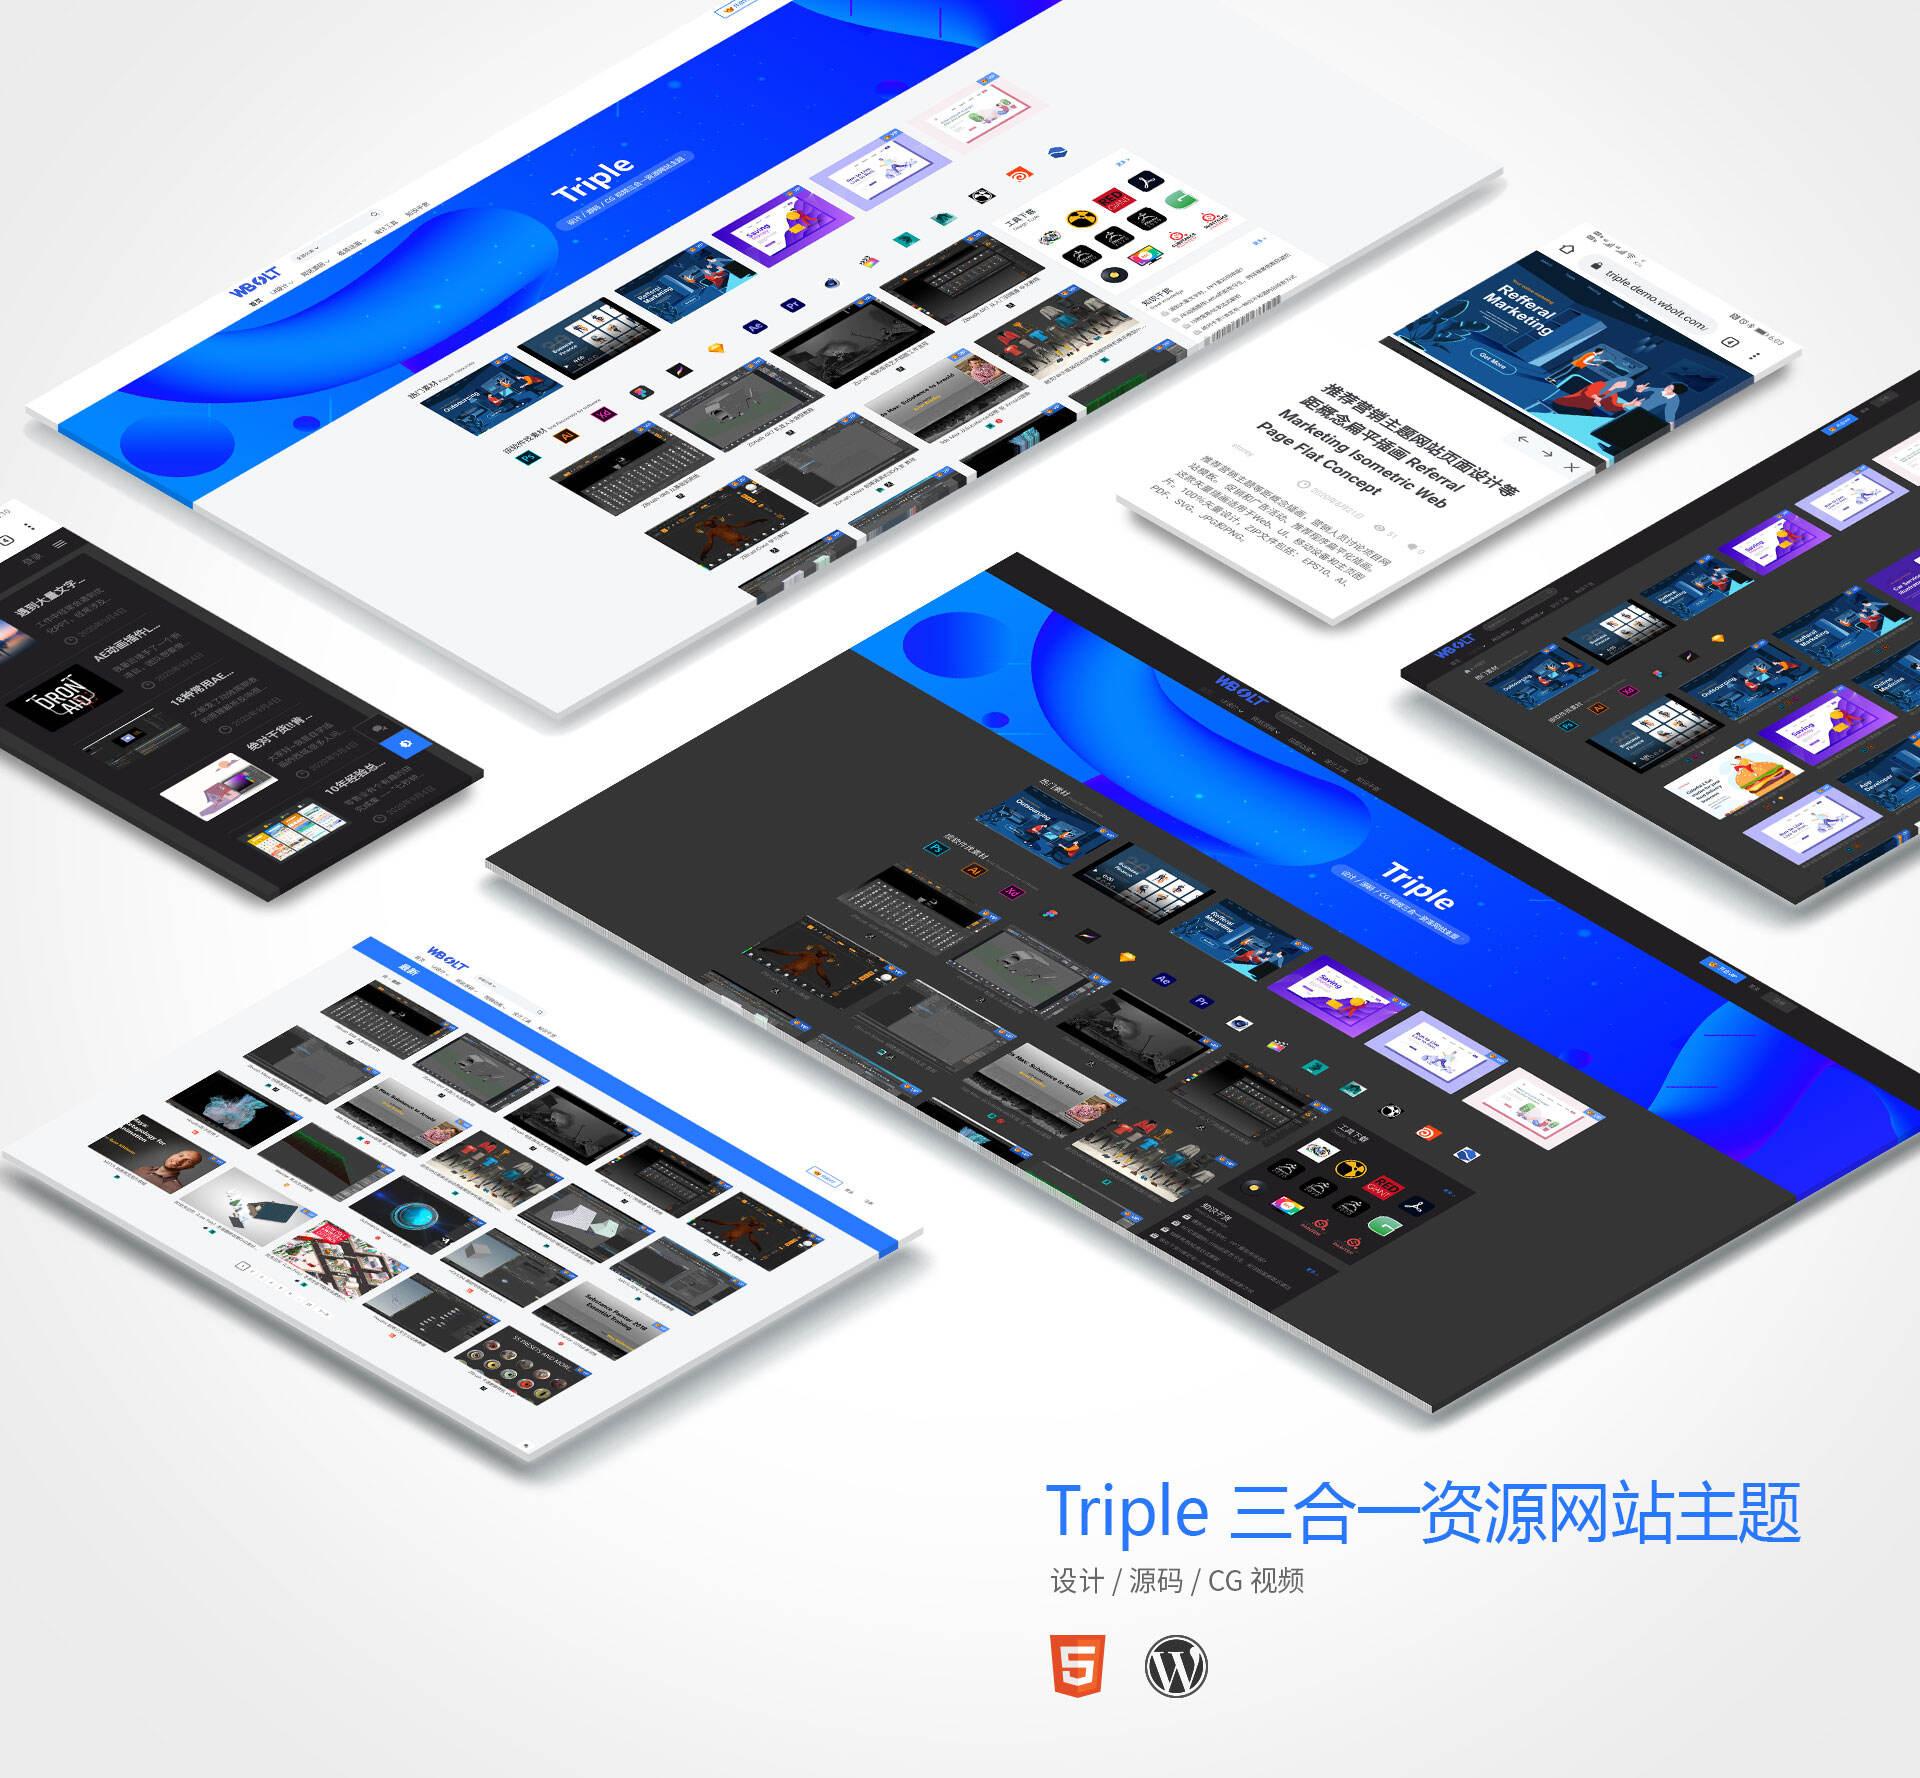 Triple-设计/源码/CG视频三合一WordPress资源站主题插图